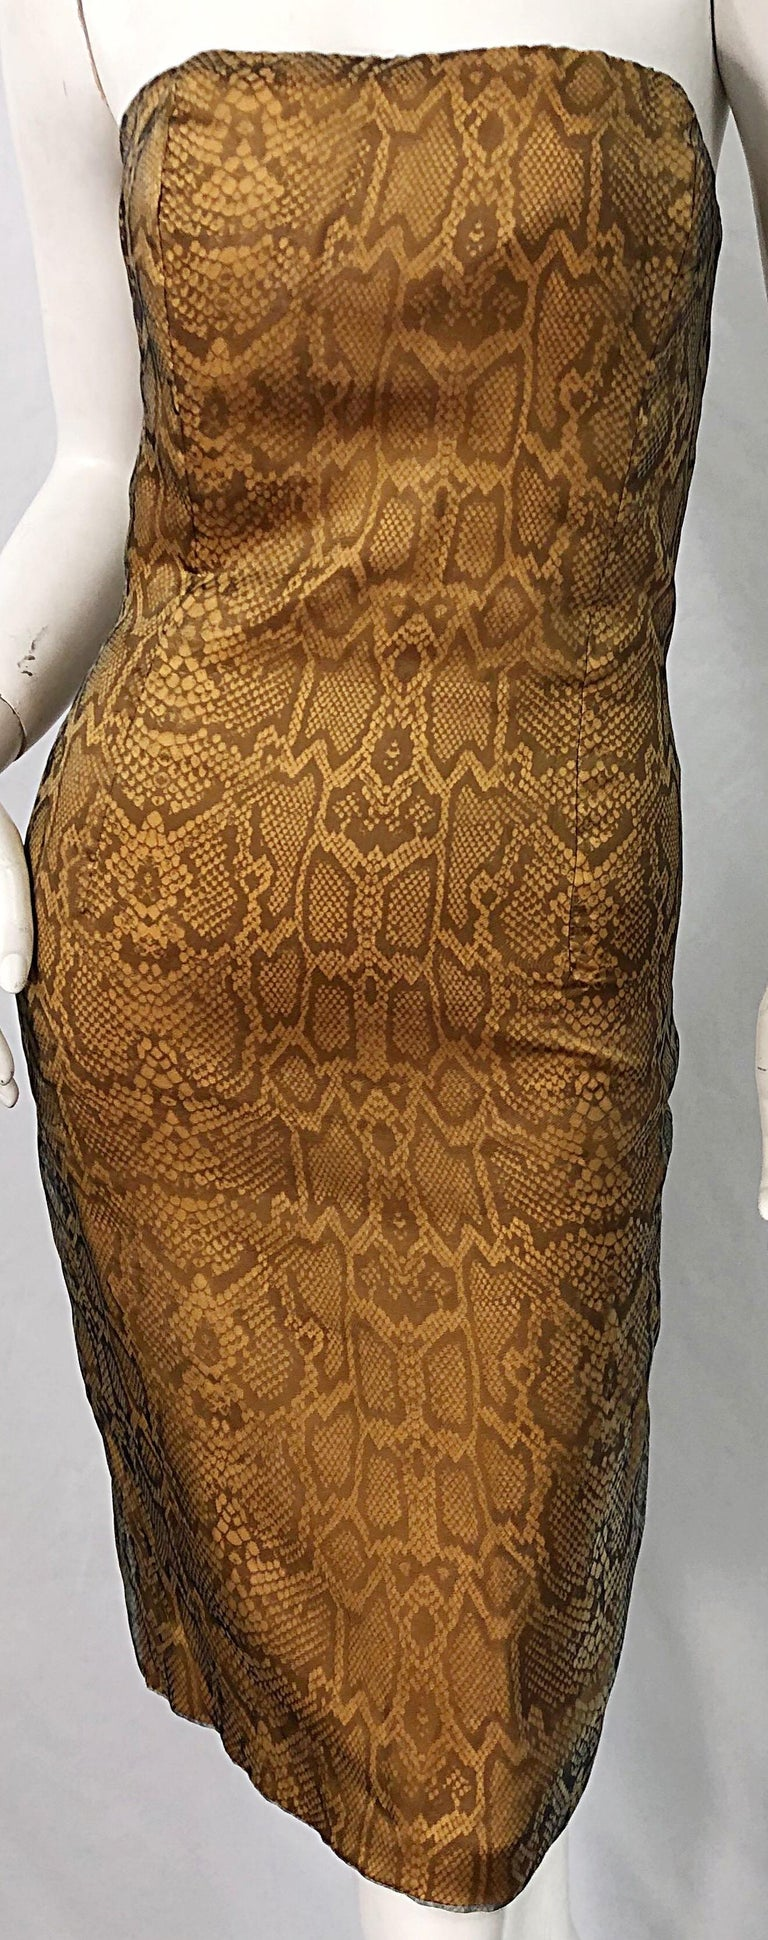 1990s Luca Luca Size 42 / 6 Snakeskin Silk Organza Strapless 90s Tan Brown Dress For Sale 5